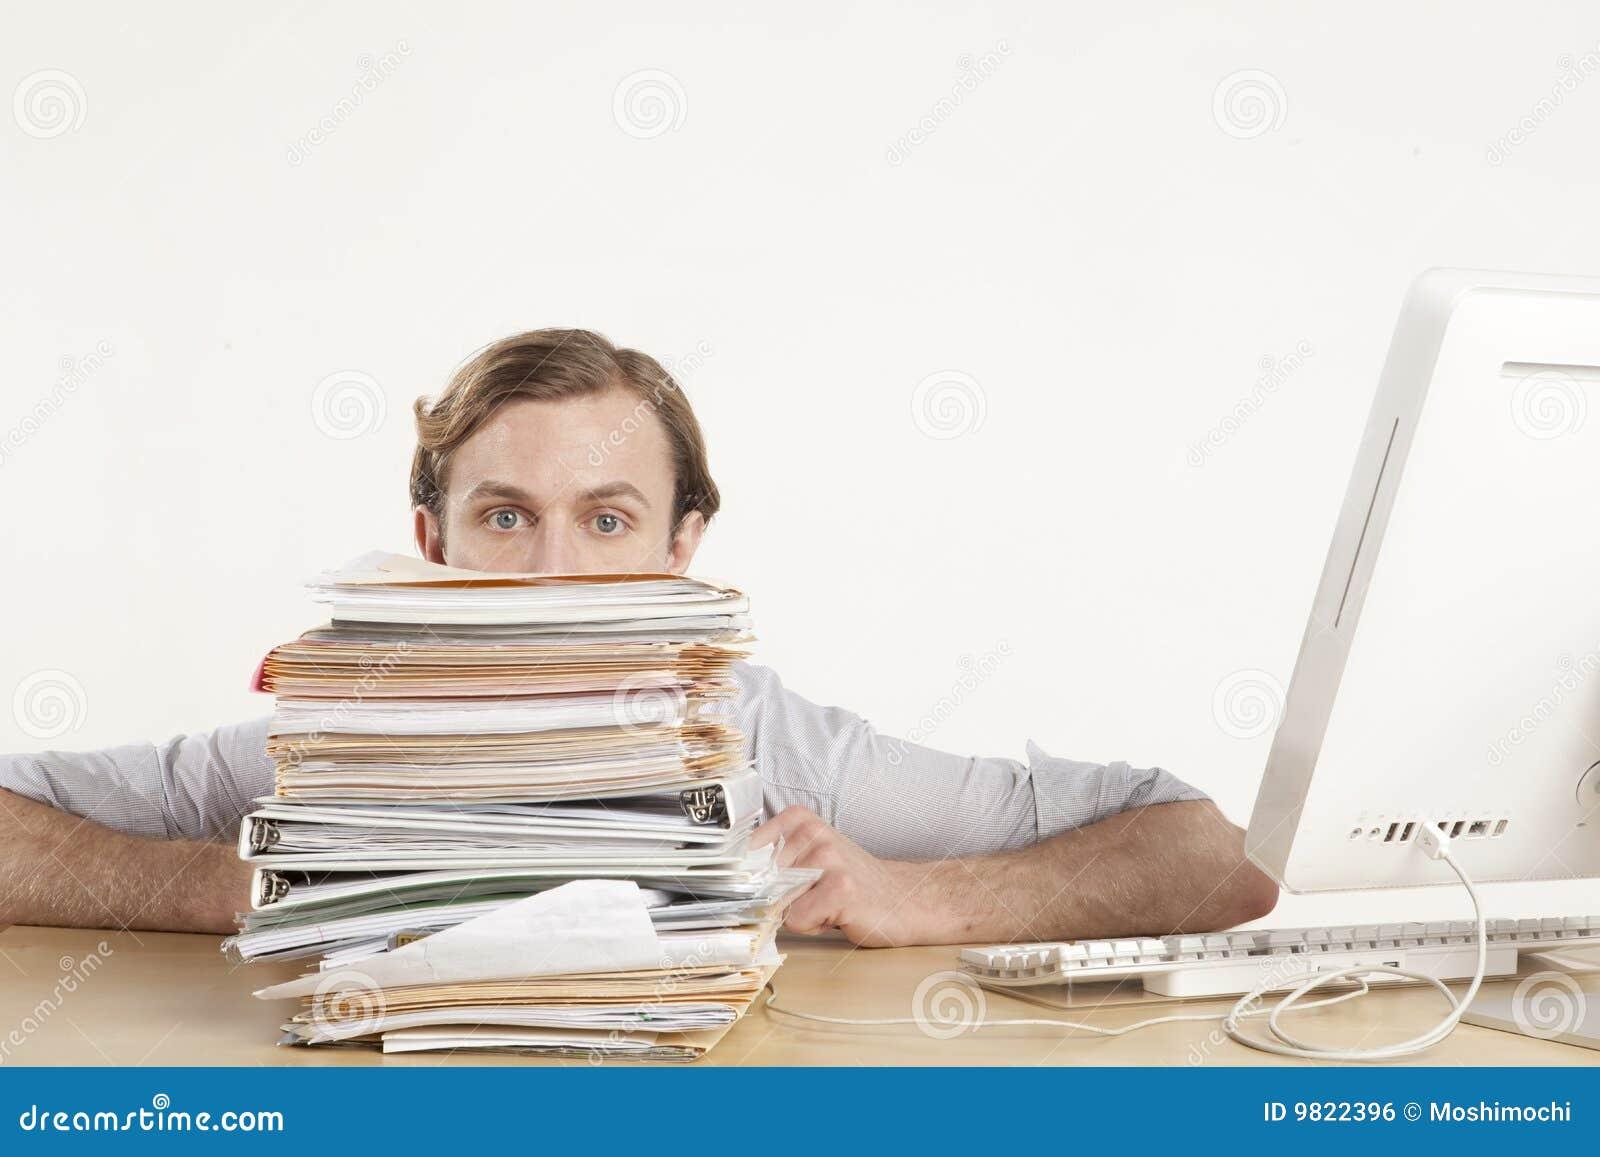 Job On Desk Royalty Free Stock Image